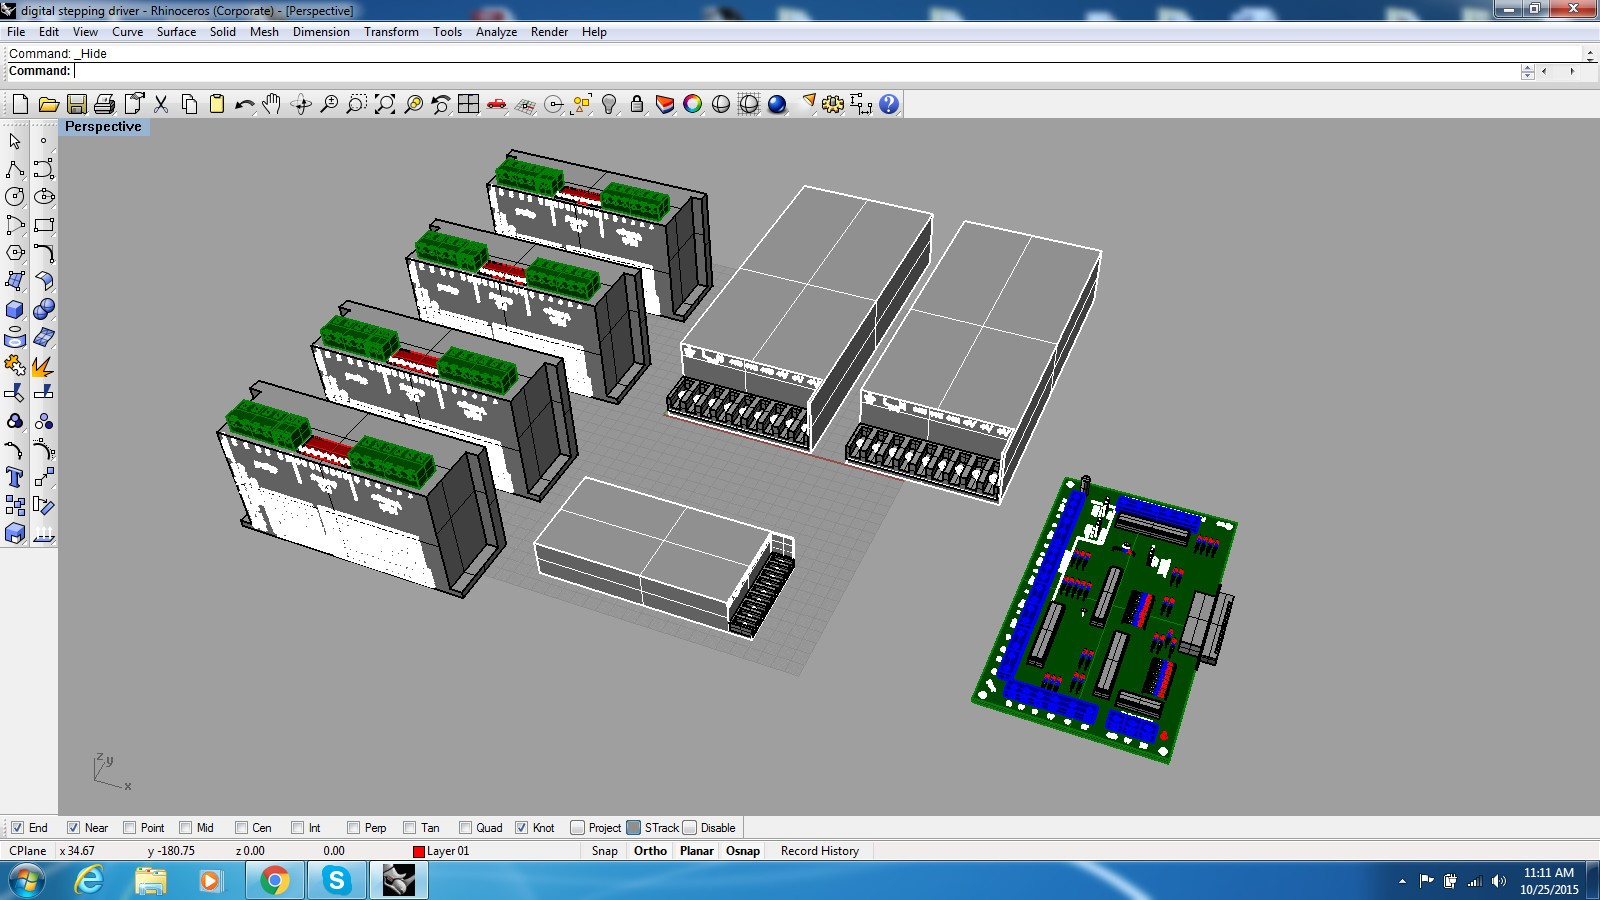 Cck5560 Diagram Wiring Schematic Furthermore C10 Breakout Board Wiring